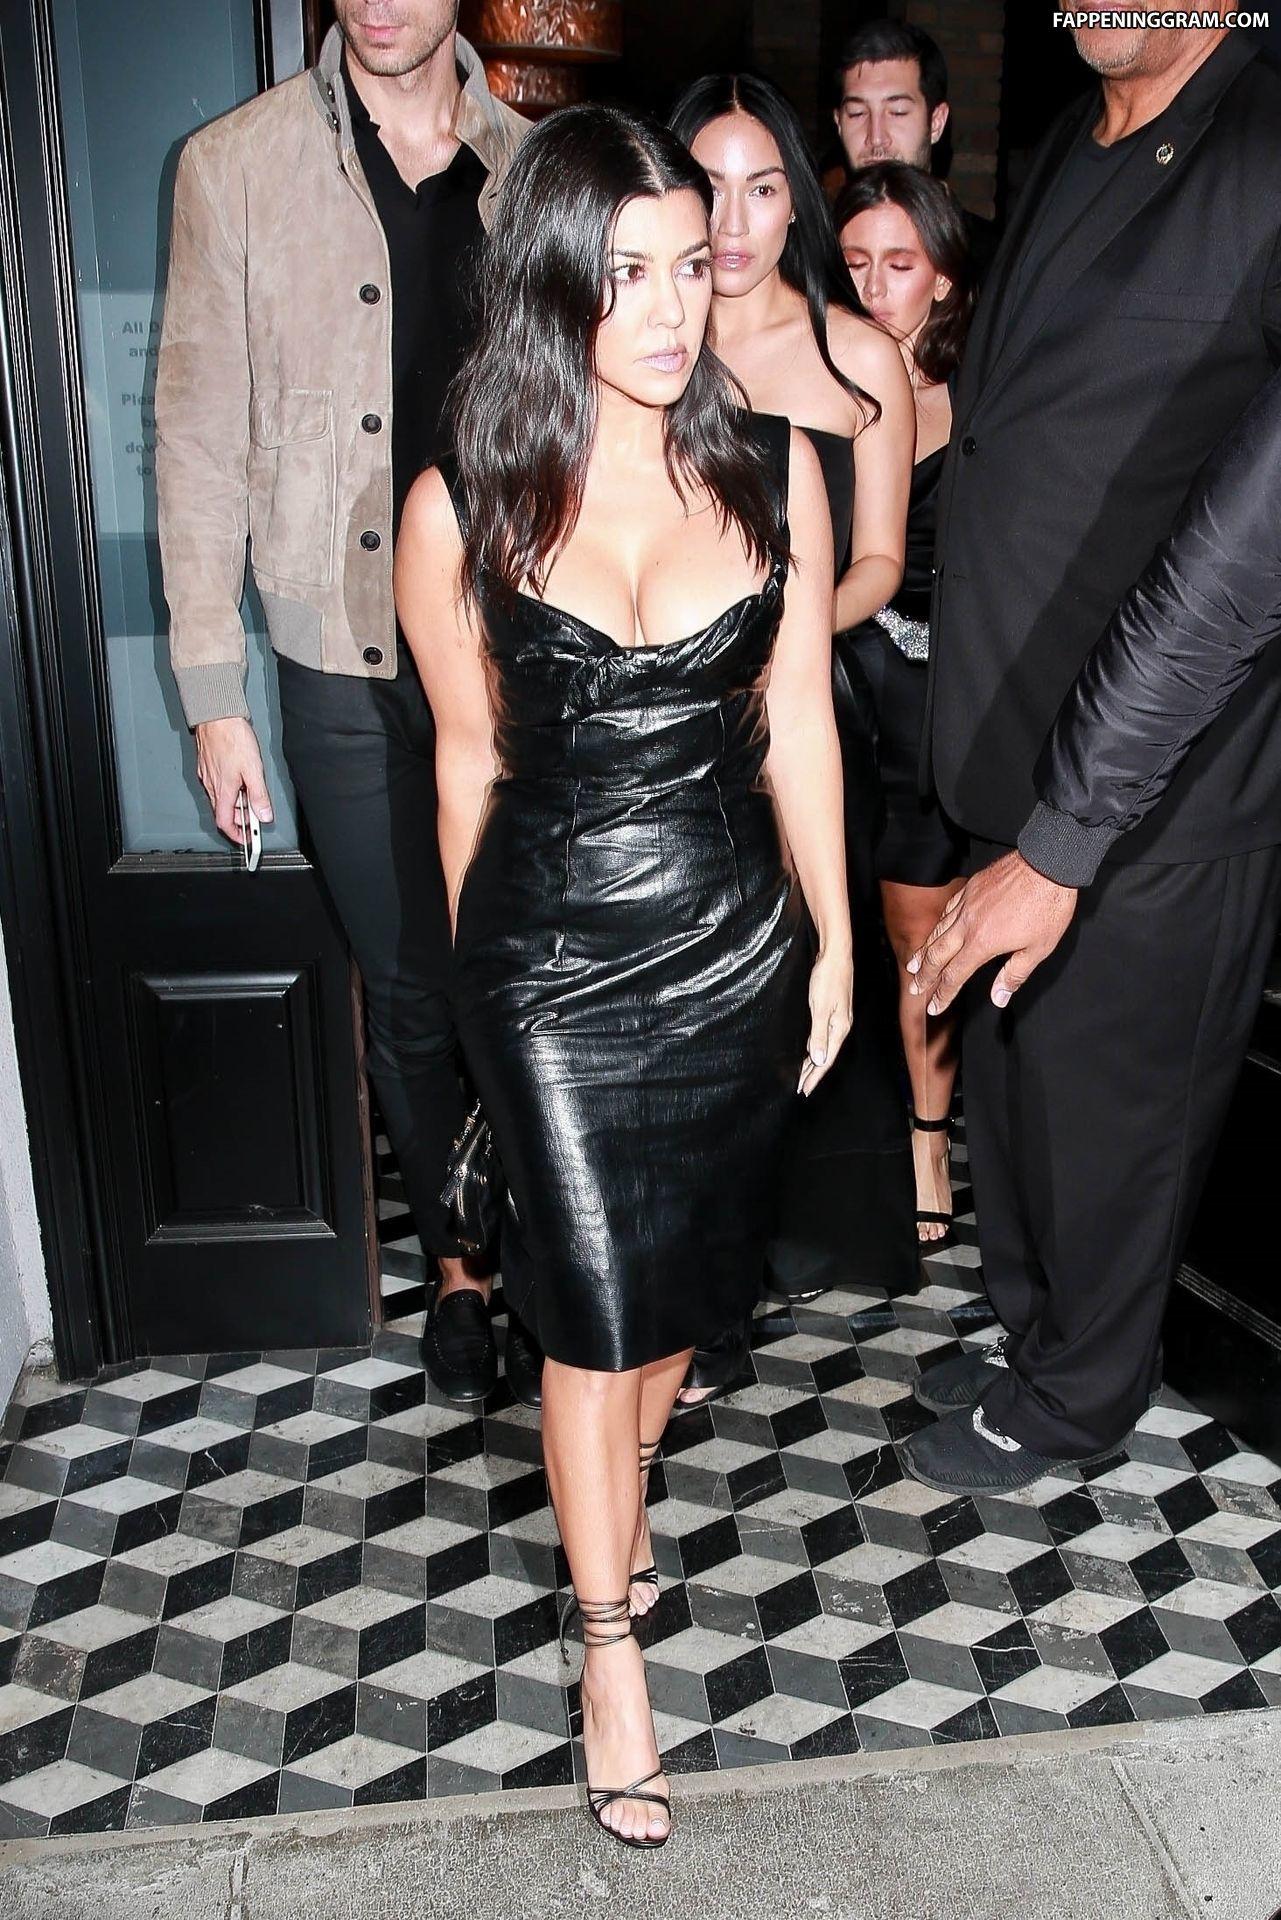 Sexy Photos of Kourtney Kardashian   The Fappening. 2014